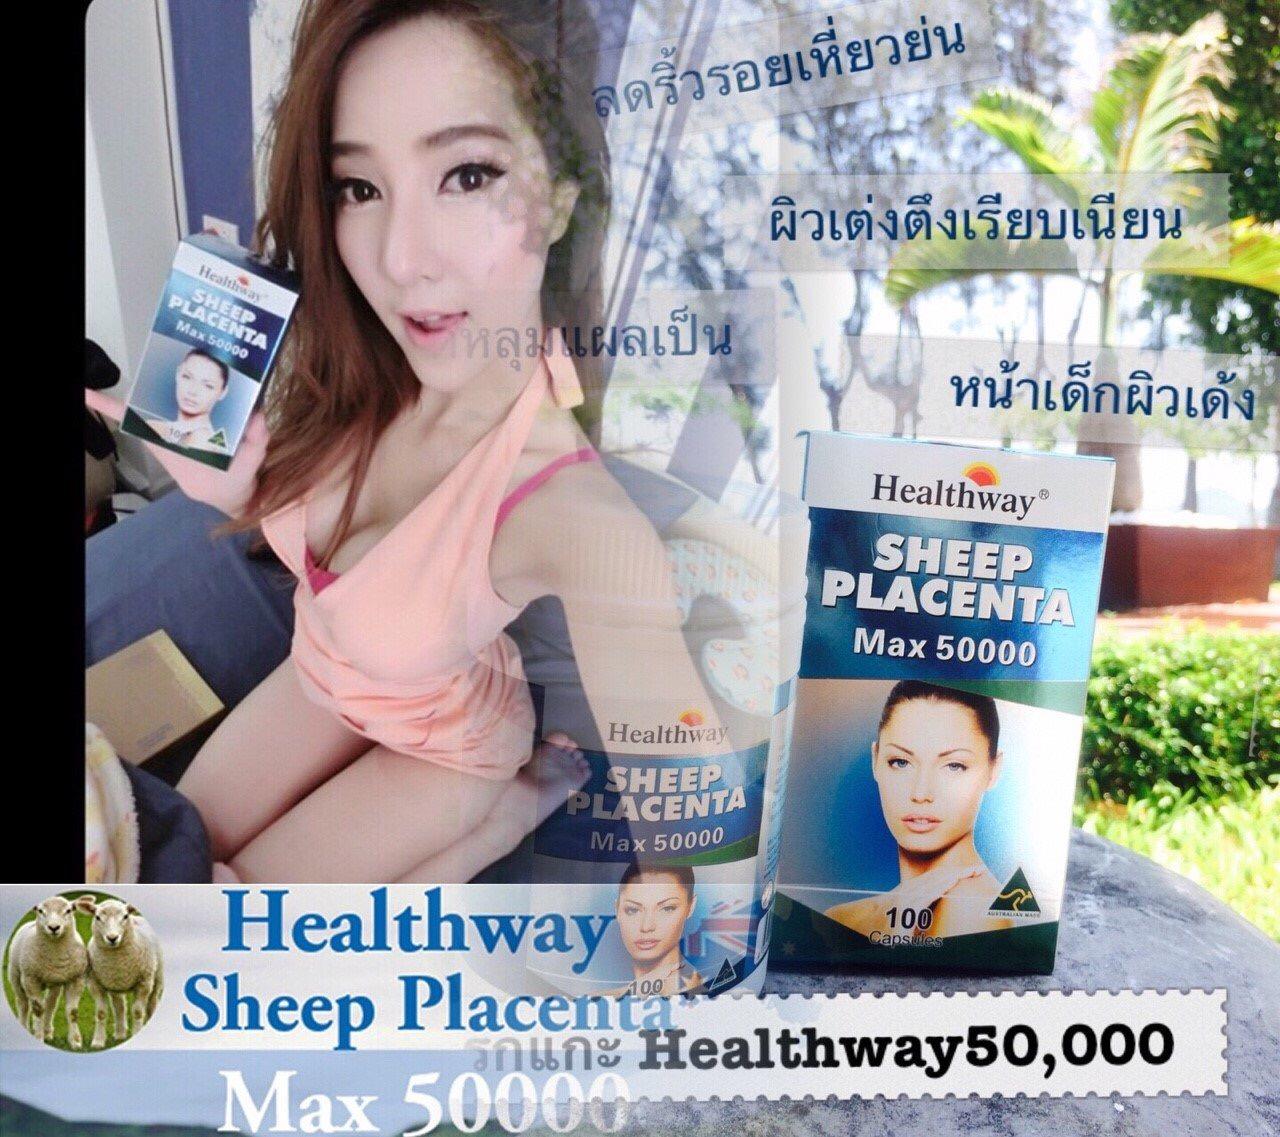 Healthway Sheep Placenta Max 50000 รกแกะเฮลท์เวย์ 100 แคปซูล